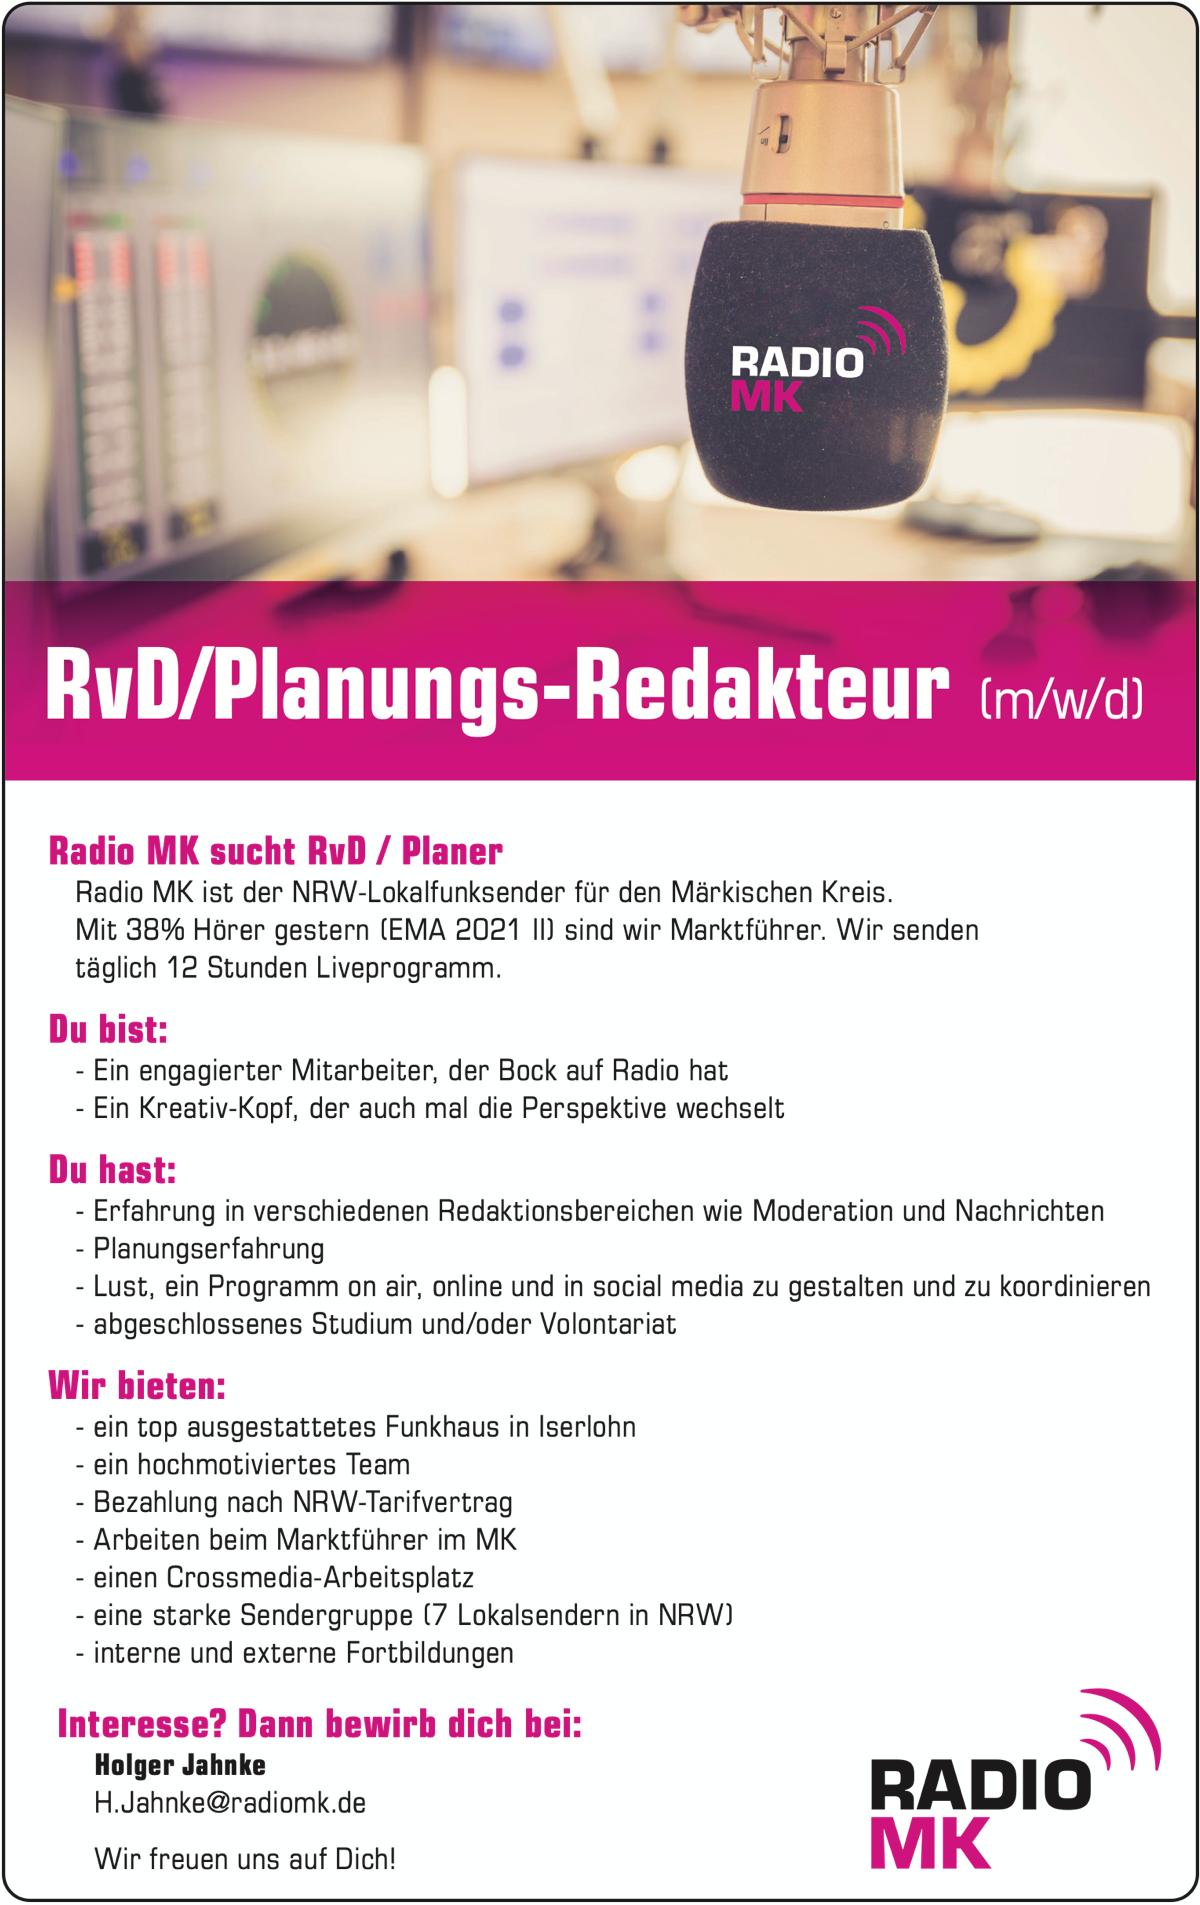 RADIO MK sucht RvD/Planungs-Redakteur (m/w/d)